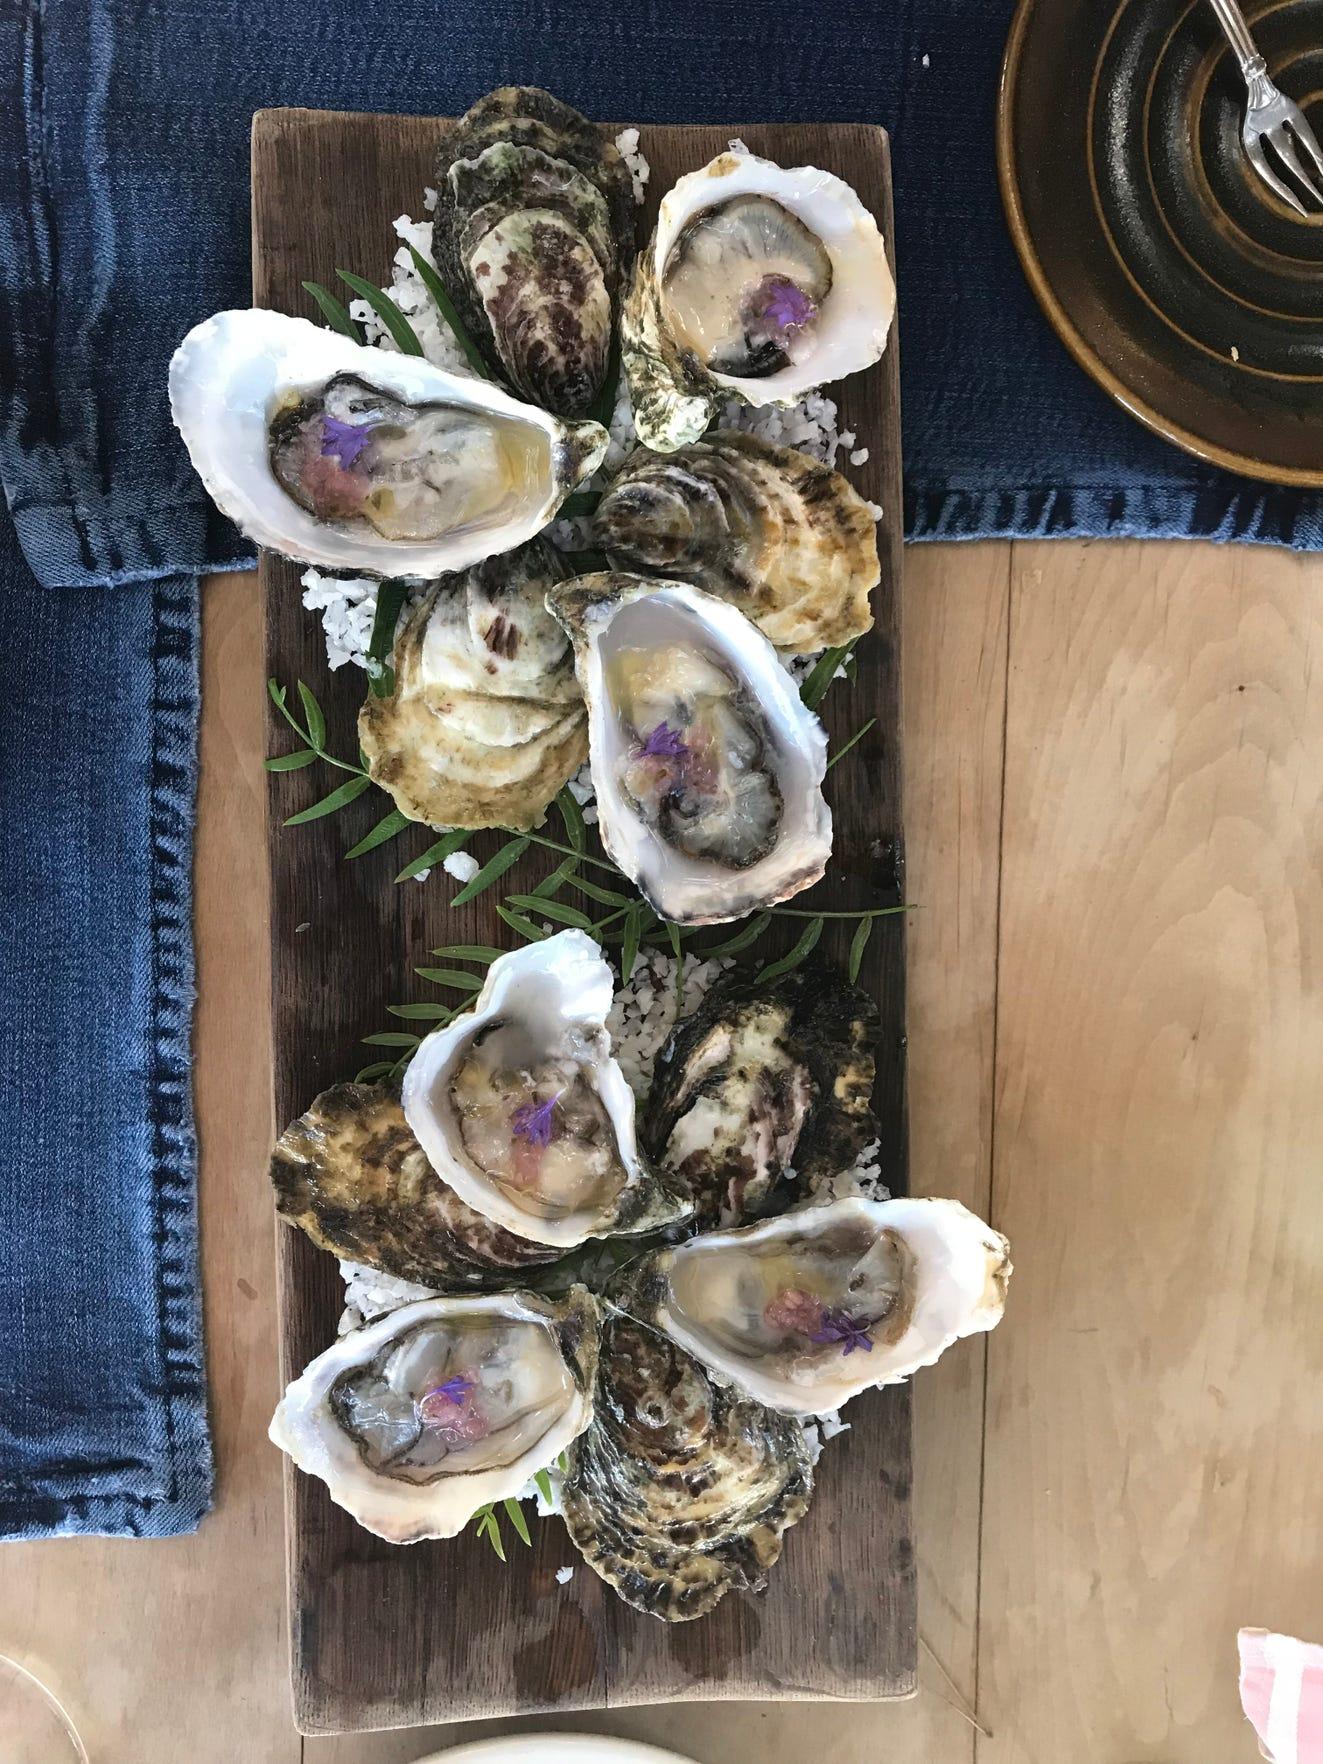 Oysters at Deckman's en el Mogor in Baja's Guadalupe Valley